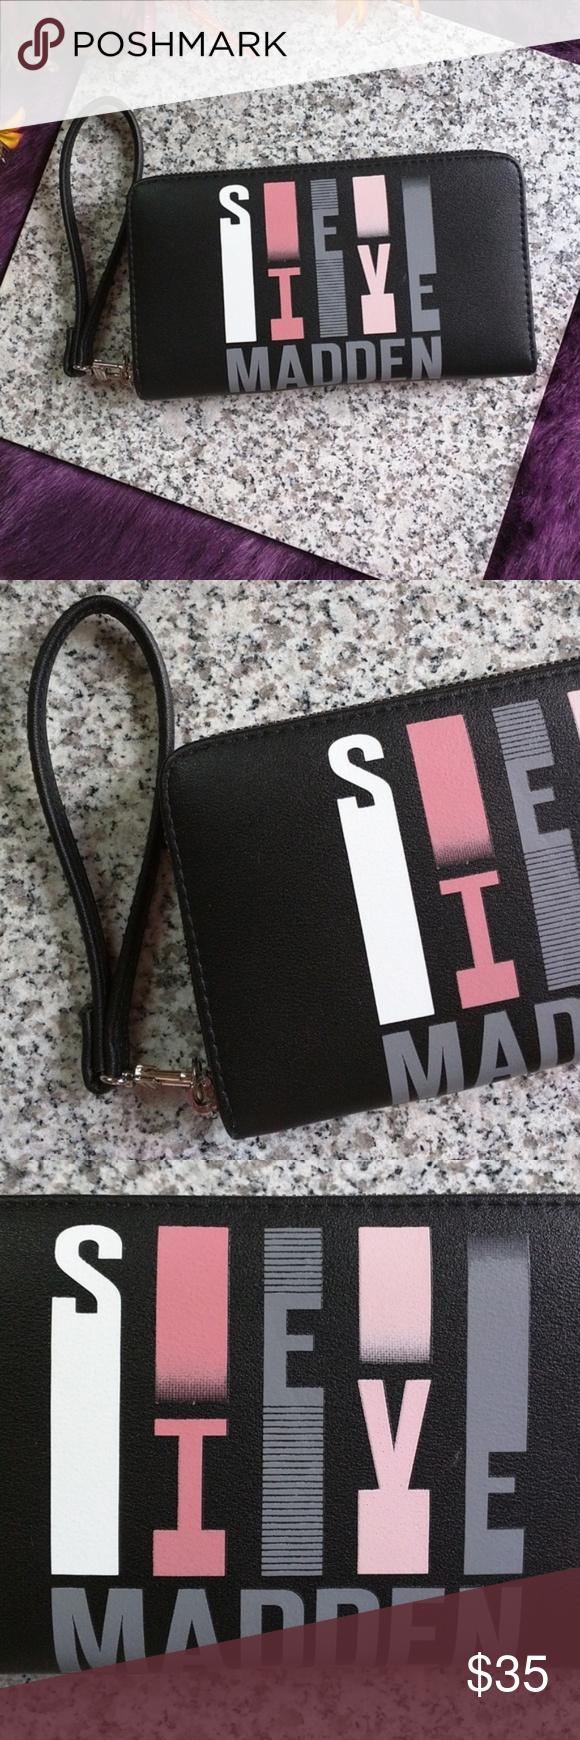 Steve Madden Zip Around Wallet Vertical Logo Nwot Steve Madden Zip Around Wallet With Vertical Logo Color Black Steve Madden Bags Logo Color Things To Sell